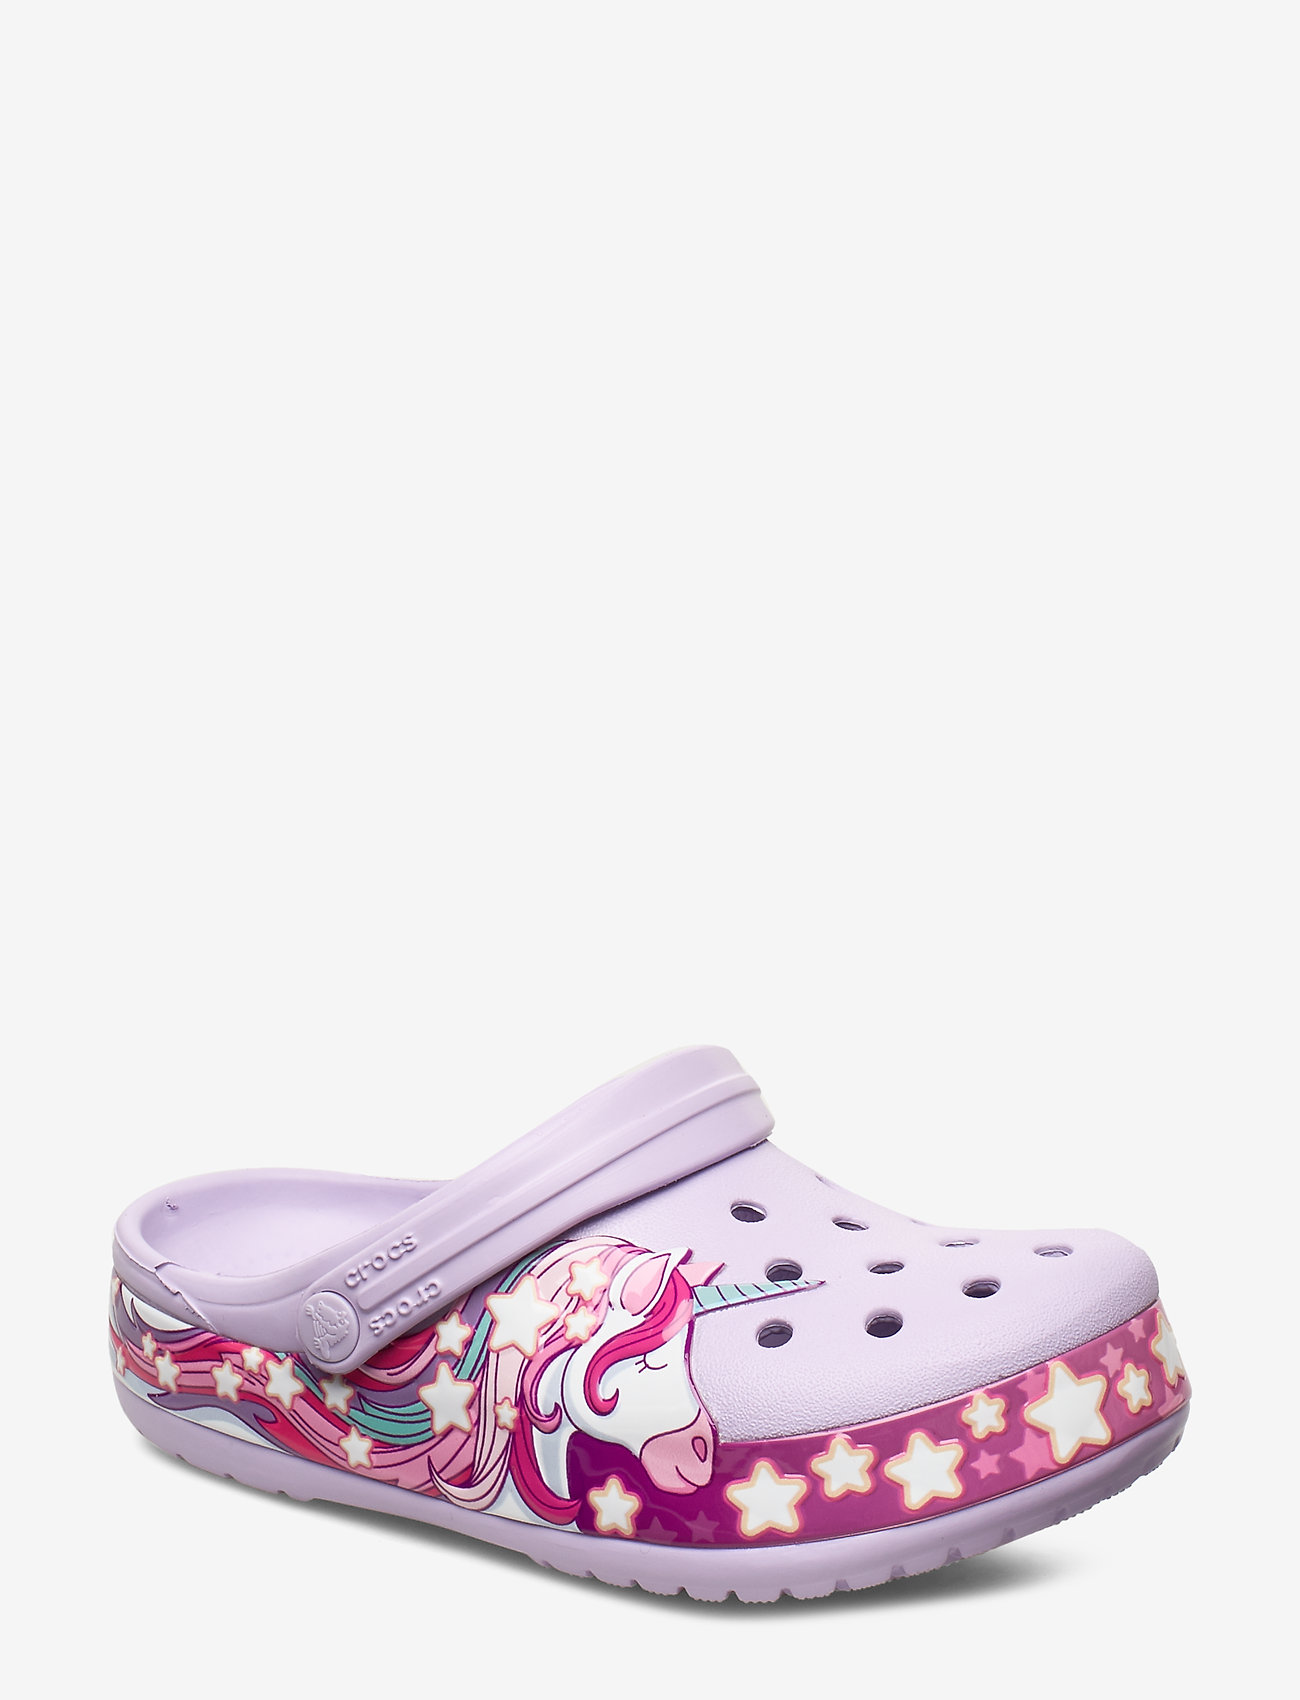 Crocs - Crocs FunLab Unicorn Band Cg K - lavender - 0